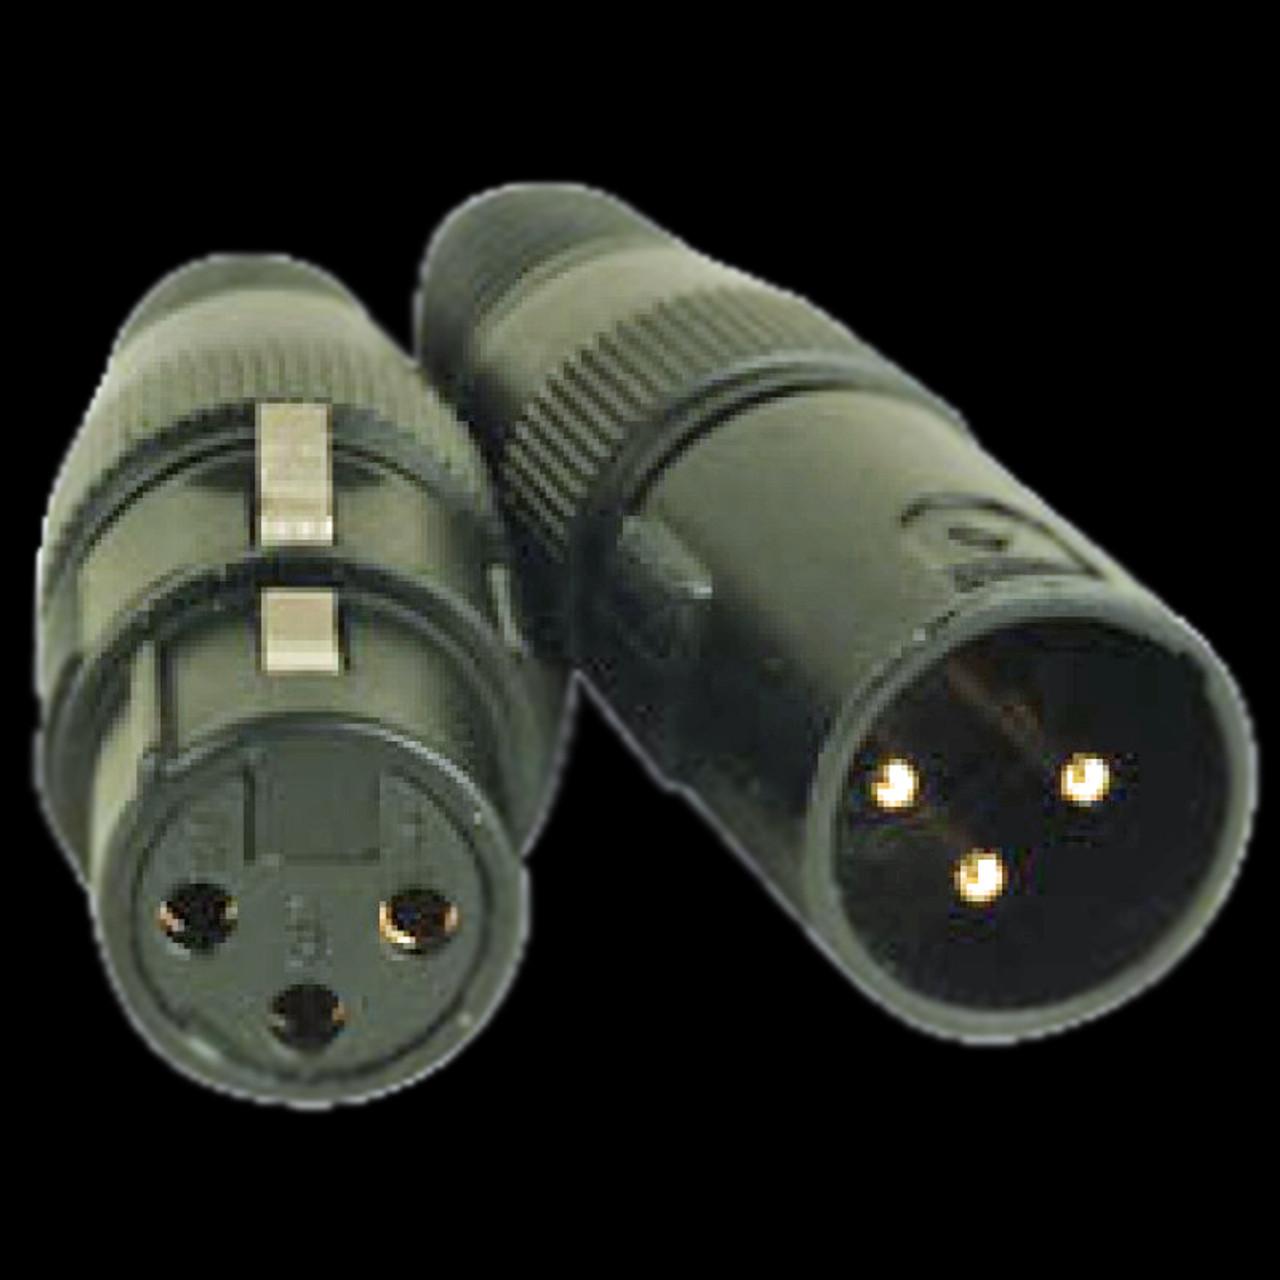 Accu Cable 25 Ft 3 Pin DMX PRO Cable / AC3PDMX25PRO